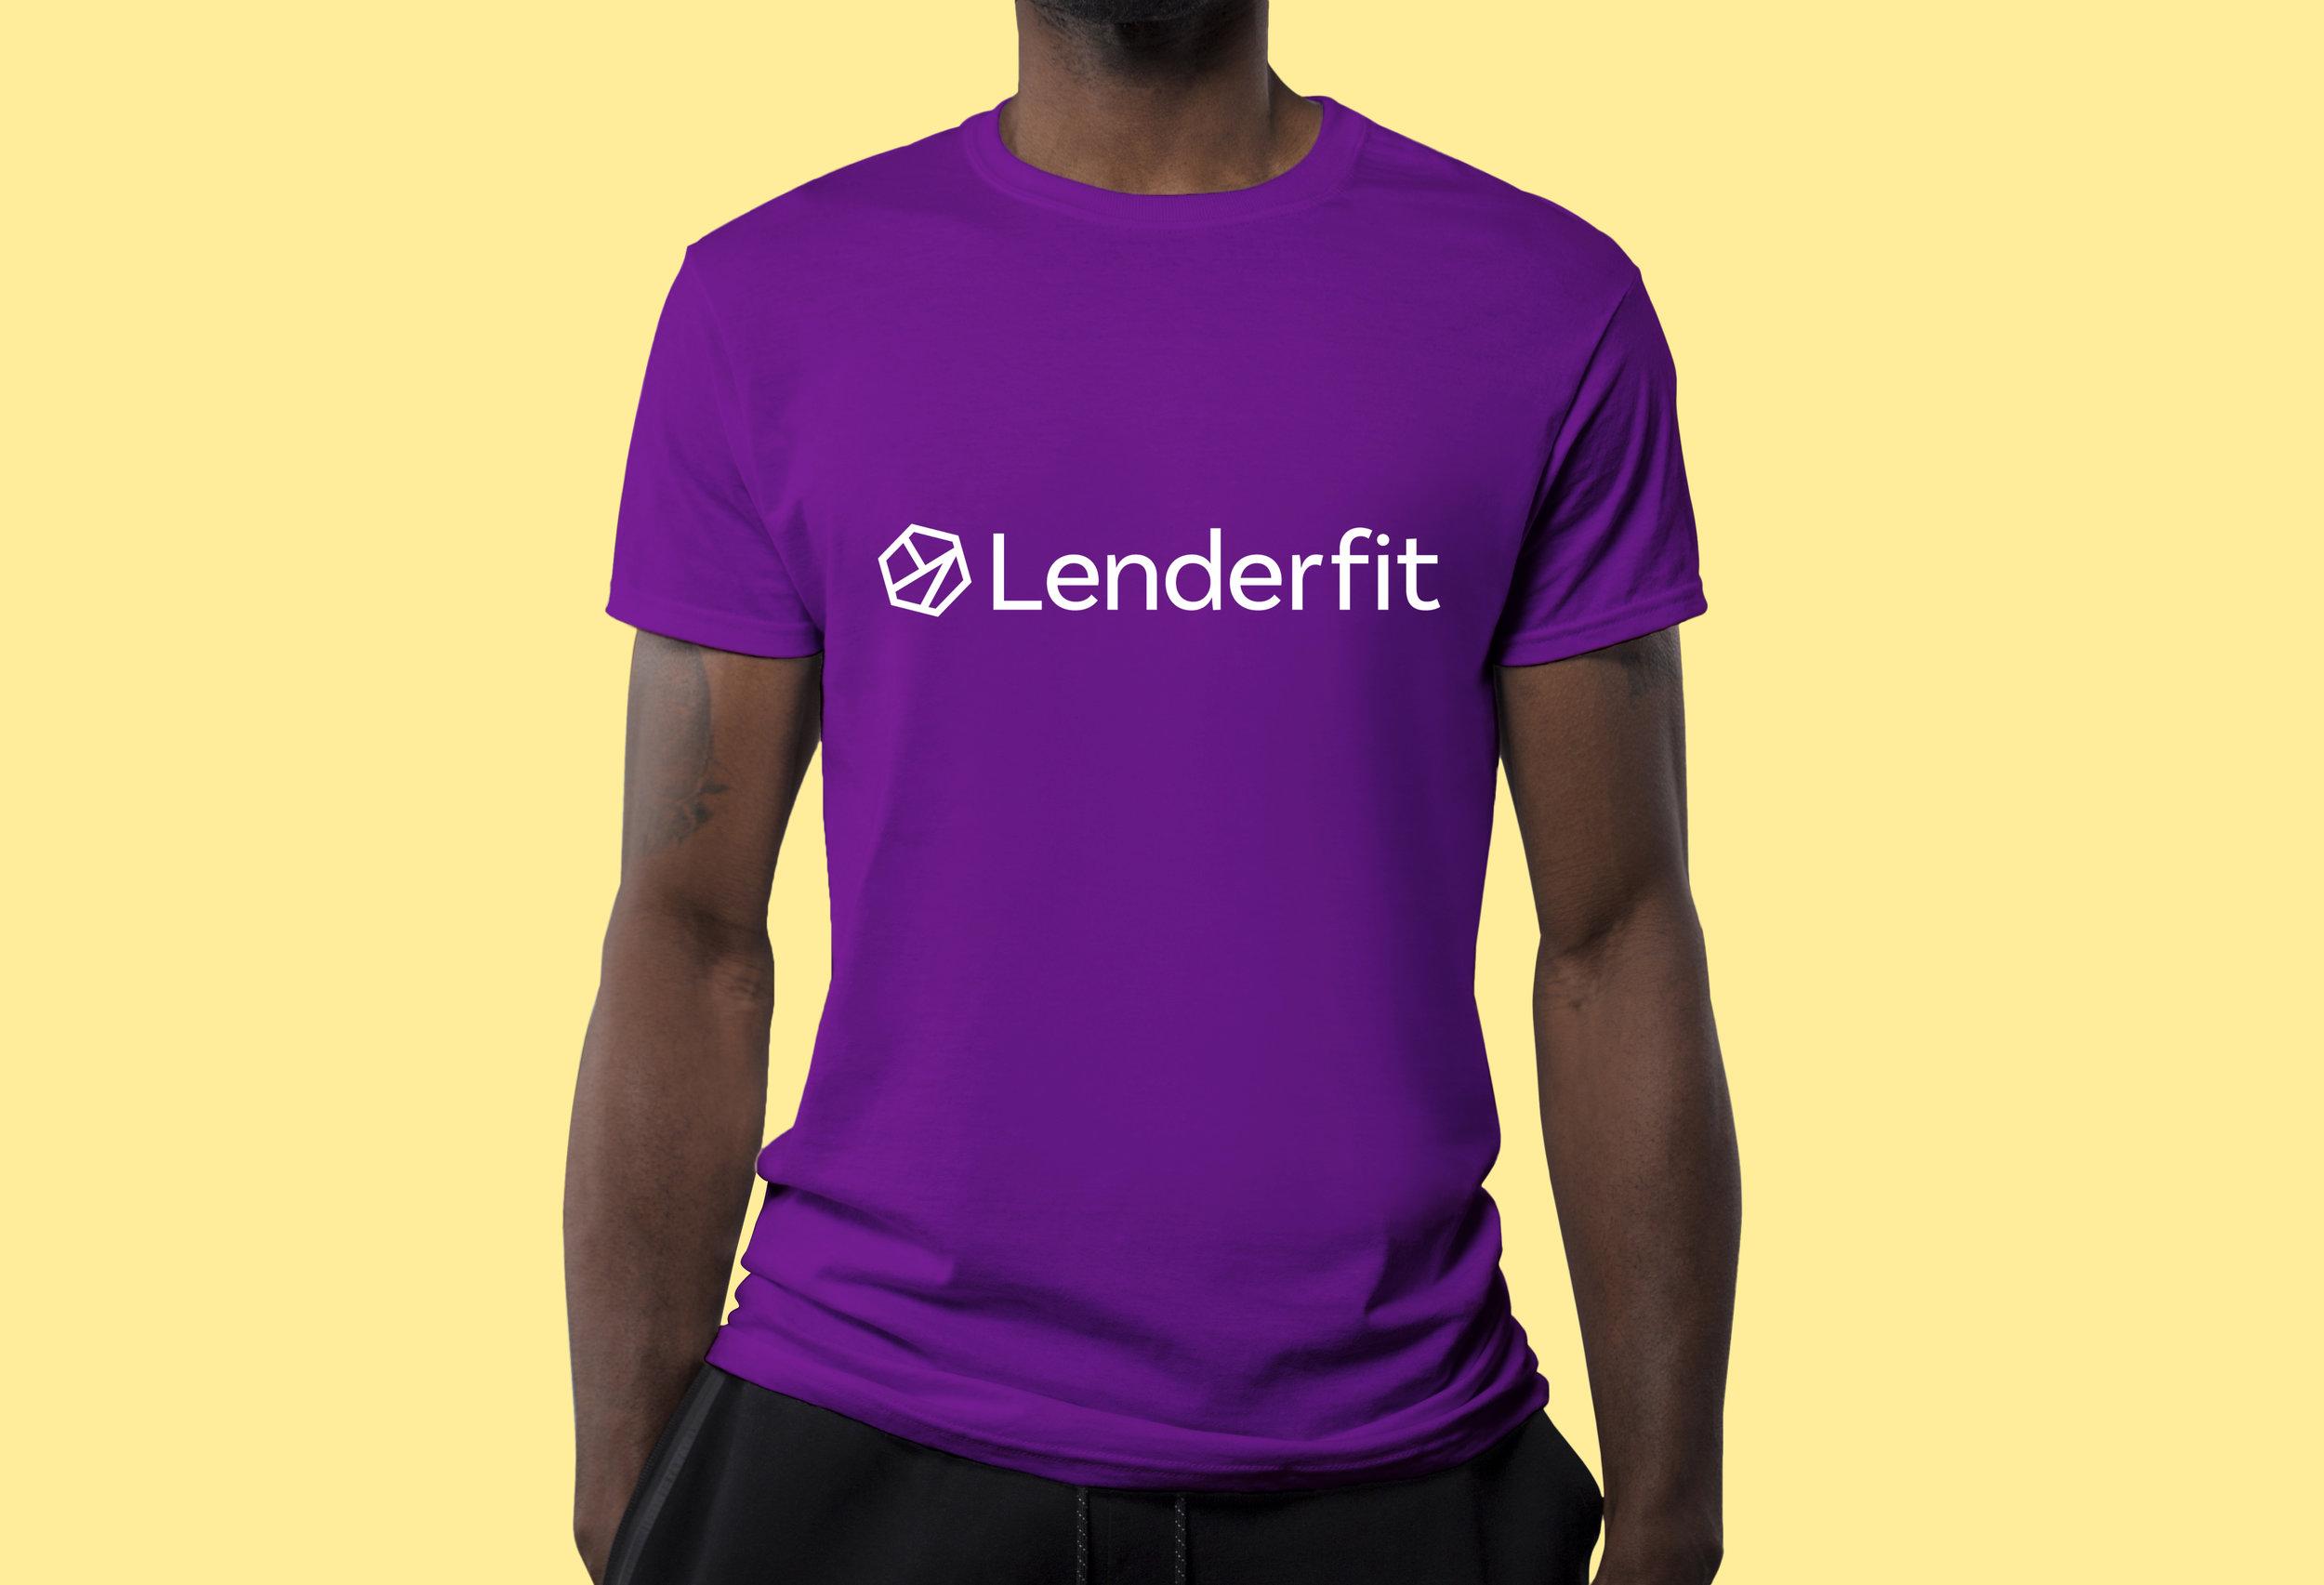 Lenderfit Misc. Products